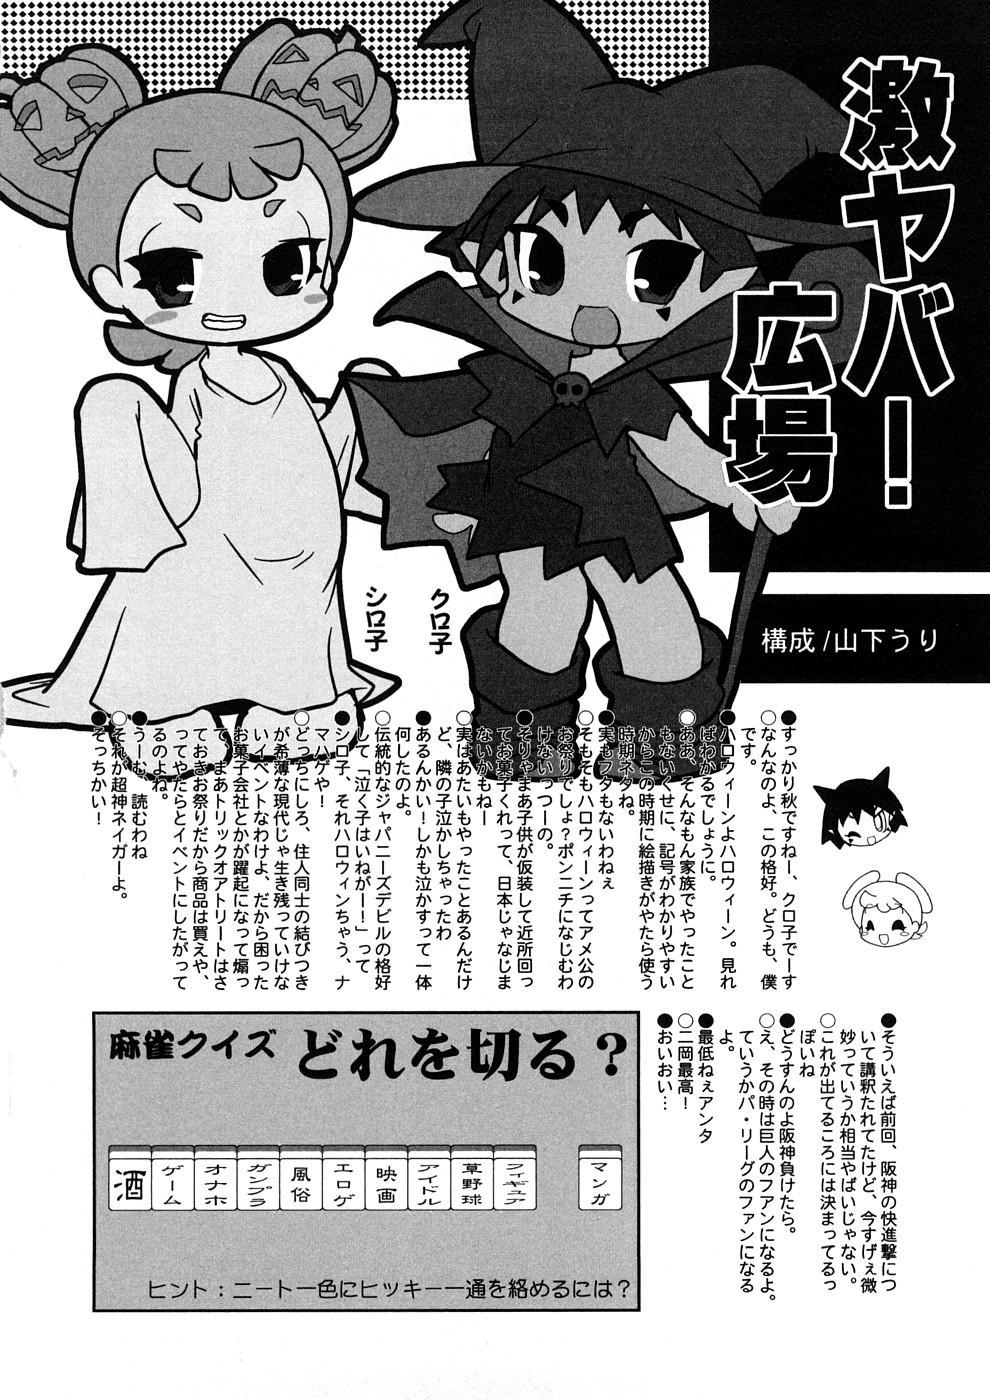 Geki Yaba Anthology Vol. 1 - Naka ni Dashite yo 248